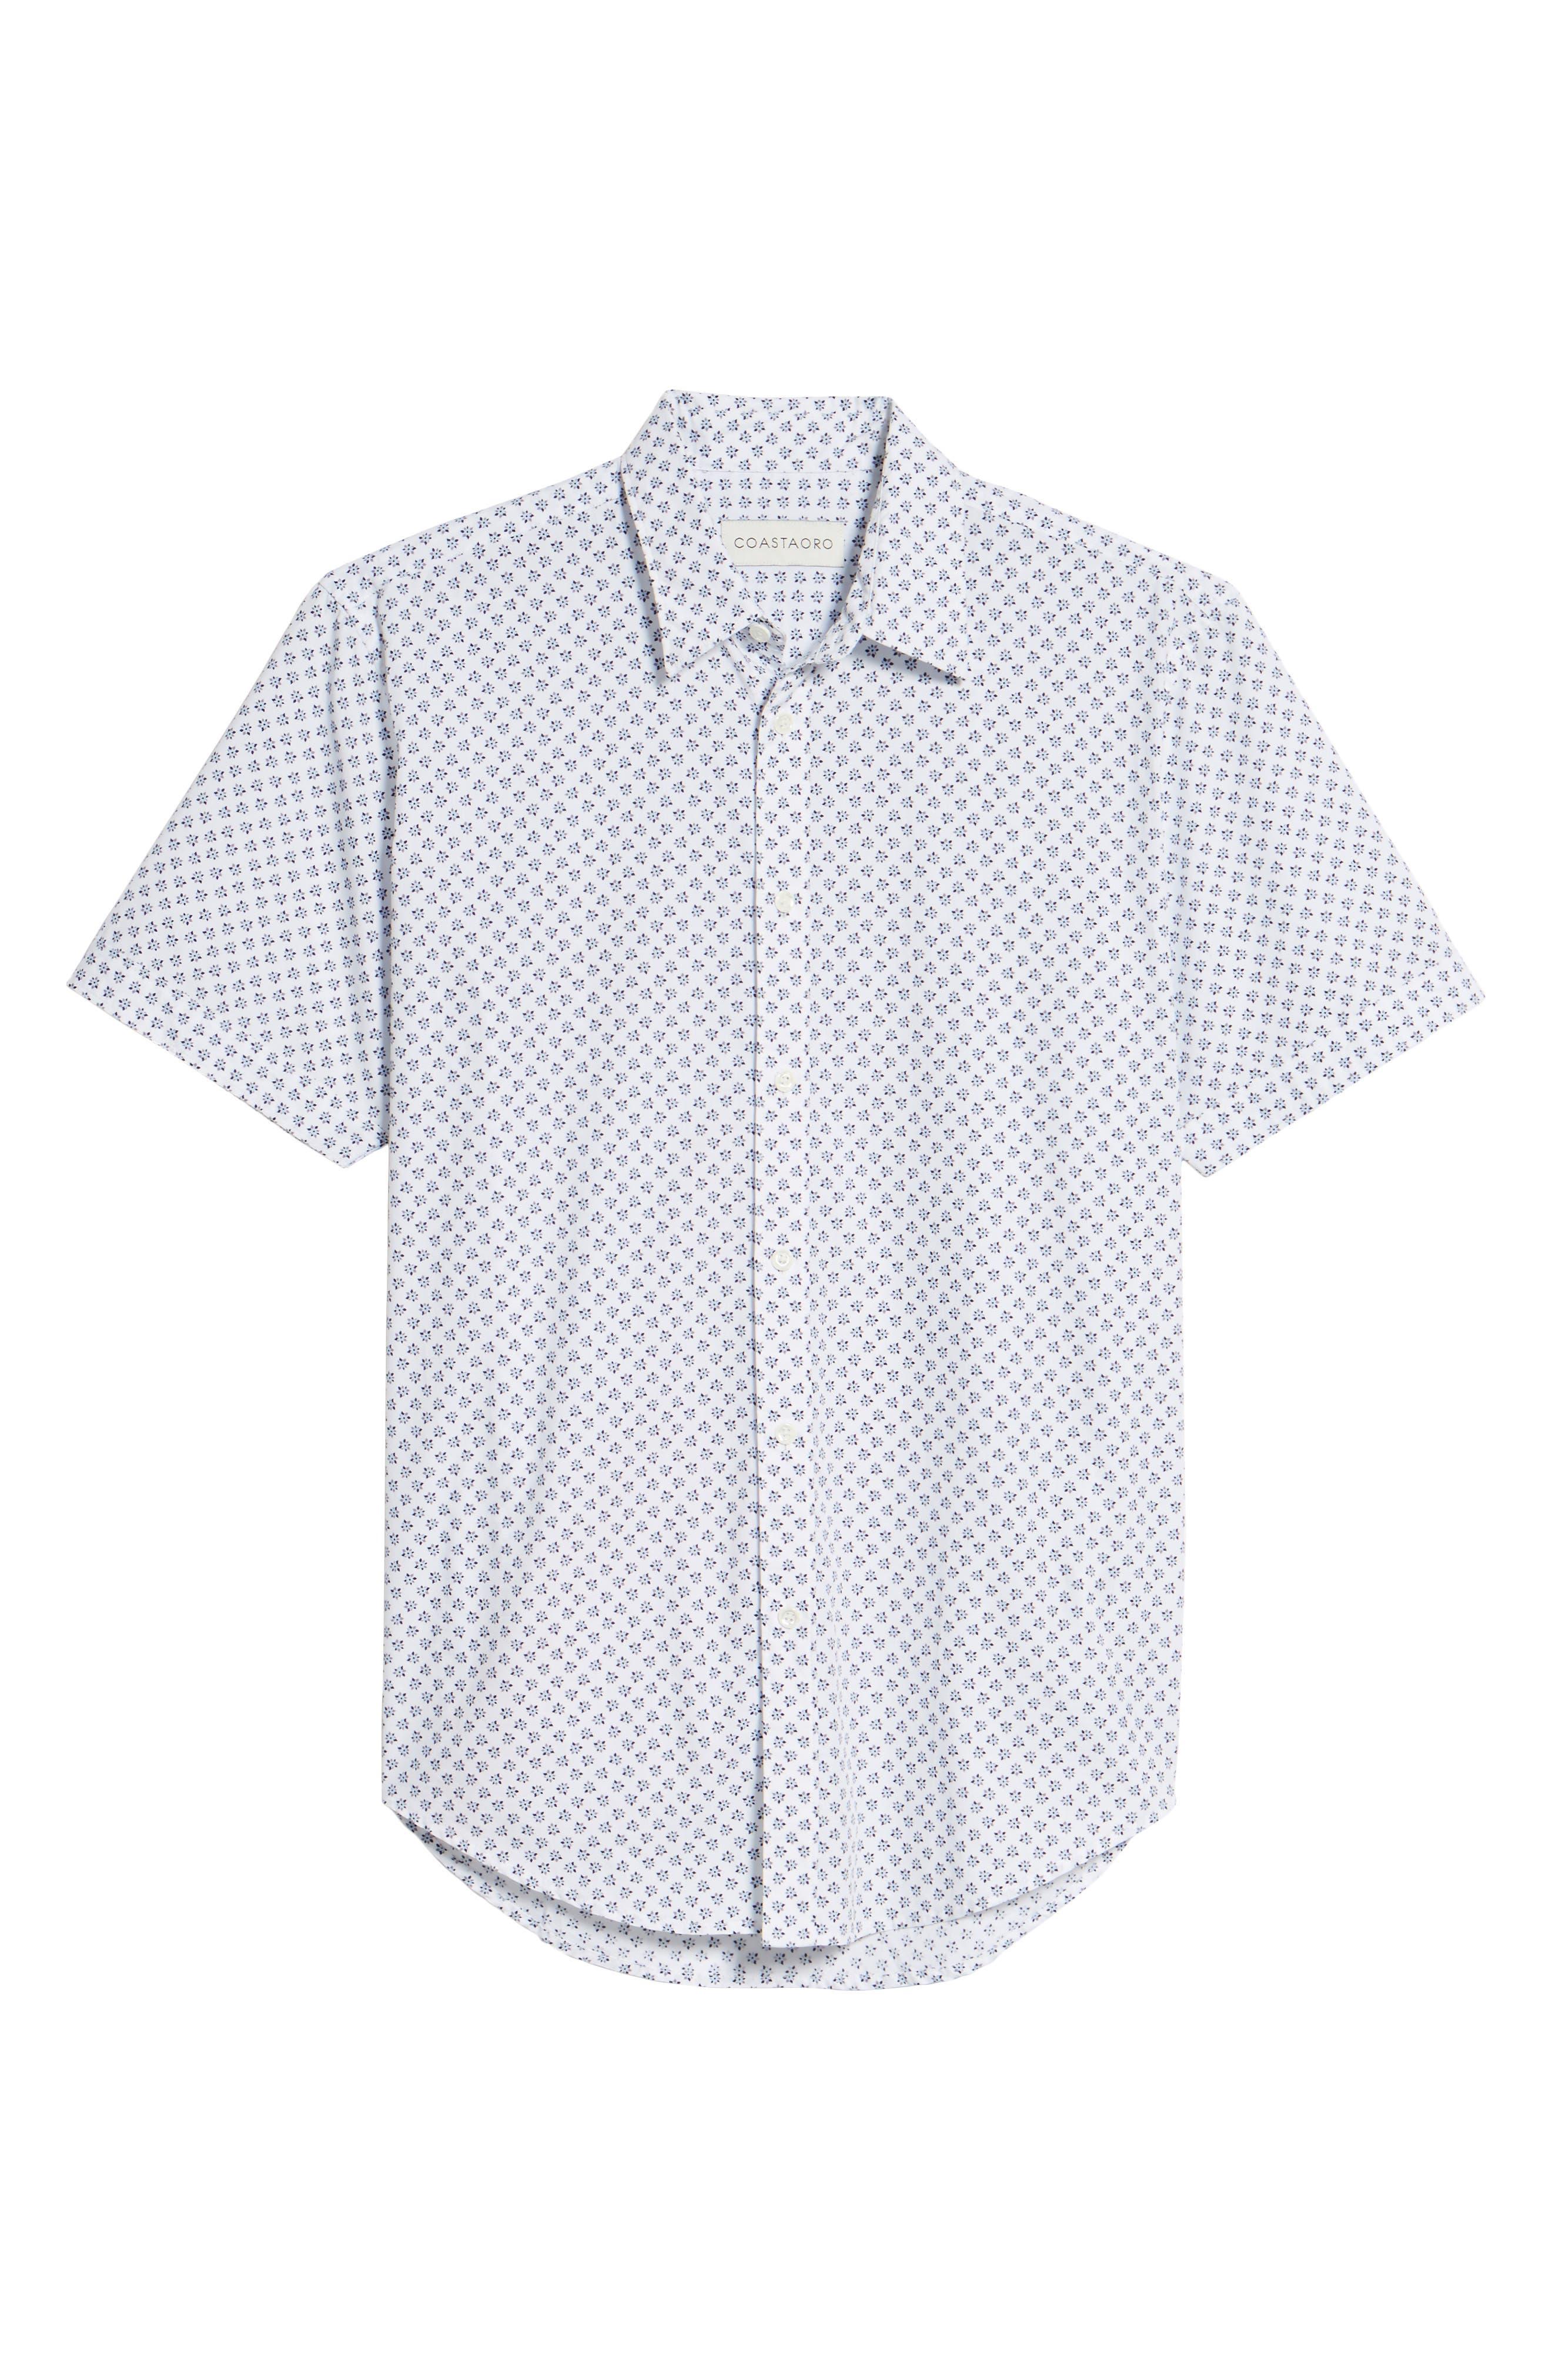 Santo Regular Fit Print Sport Shirt,                             Alternate thumbnail 6, color,                             001